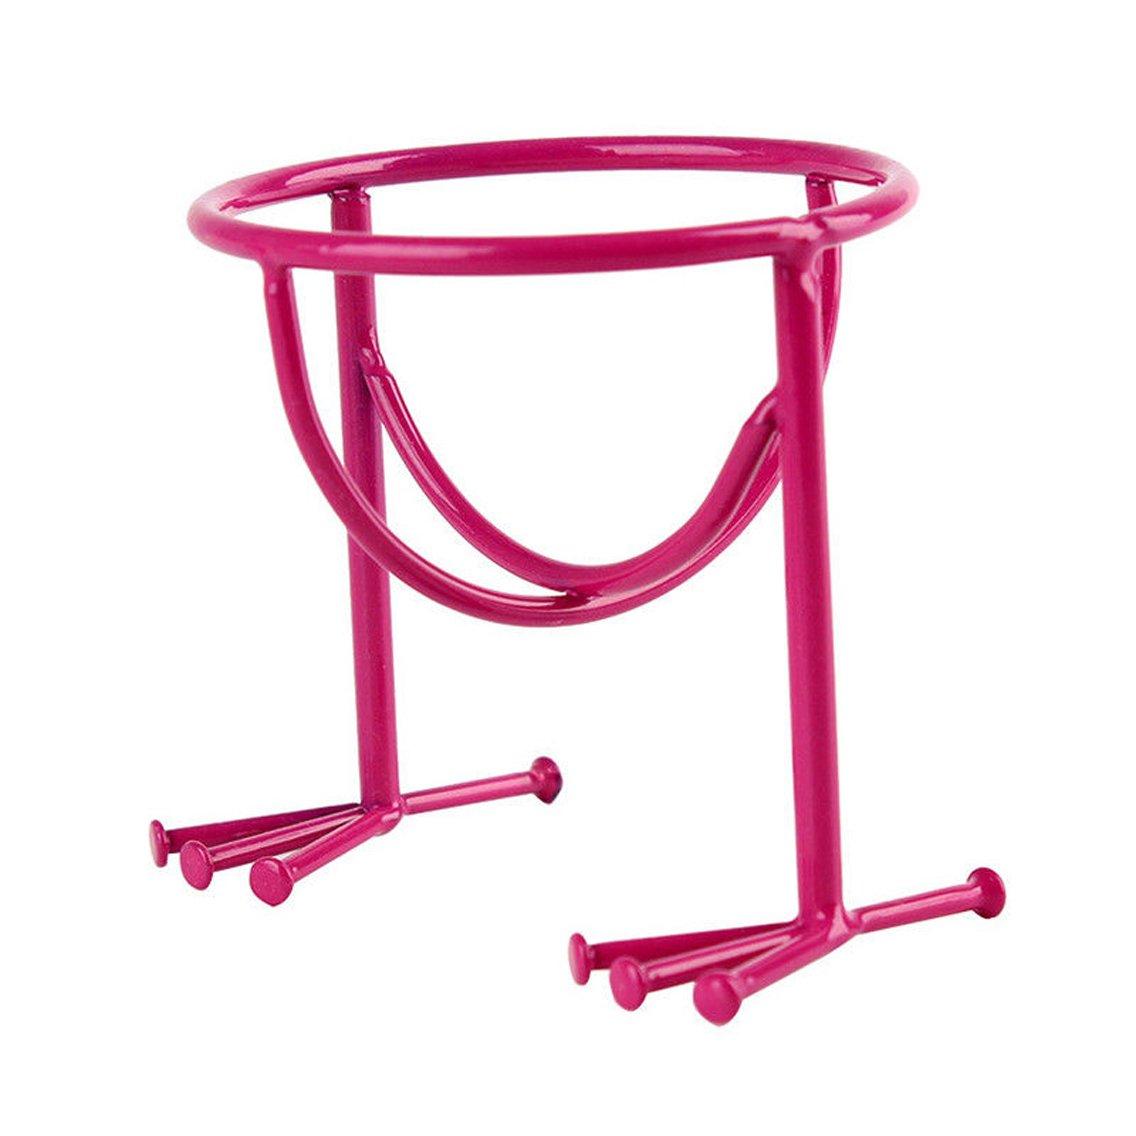 Diconna Makeup Stencil Powder Puff Sponge Stand Holder Storage Organizer Drying Rack (Rose red)